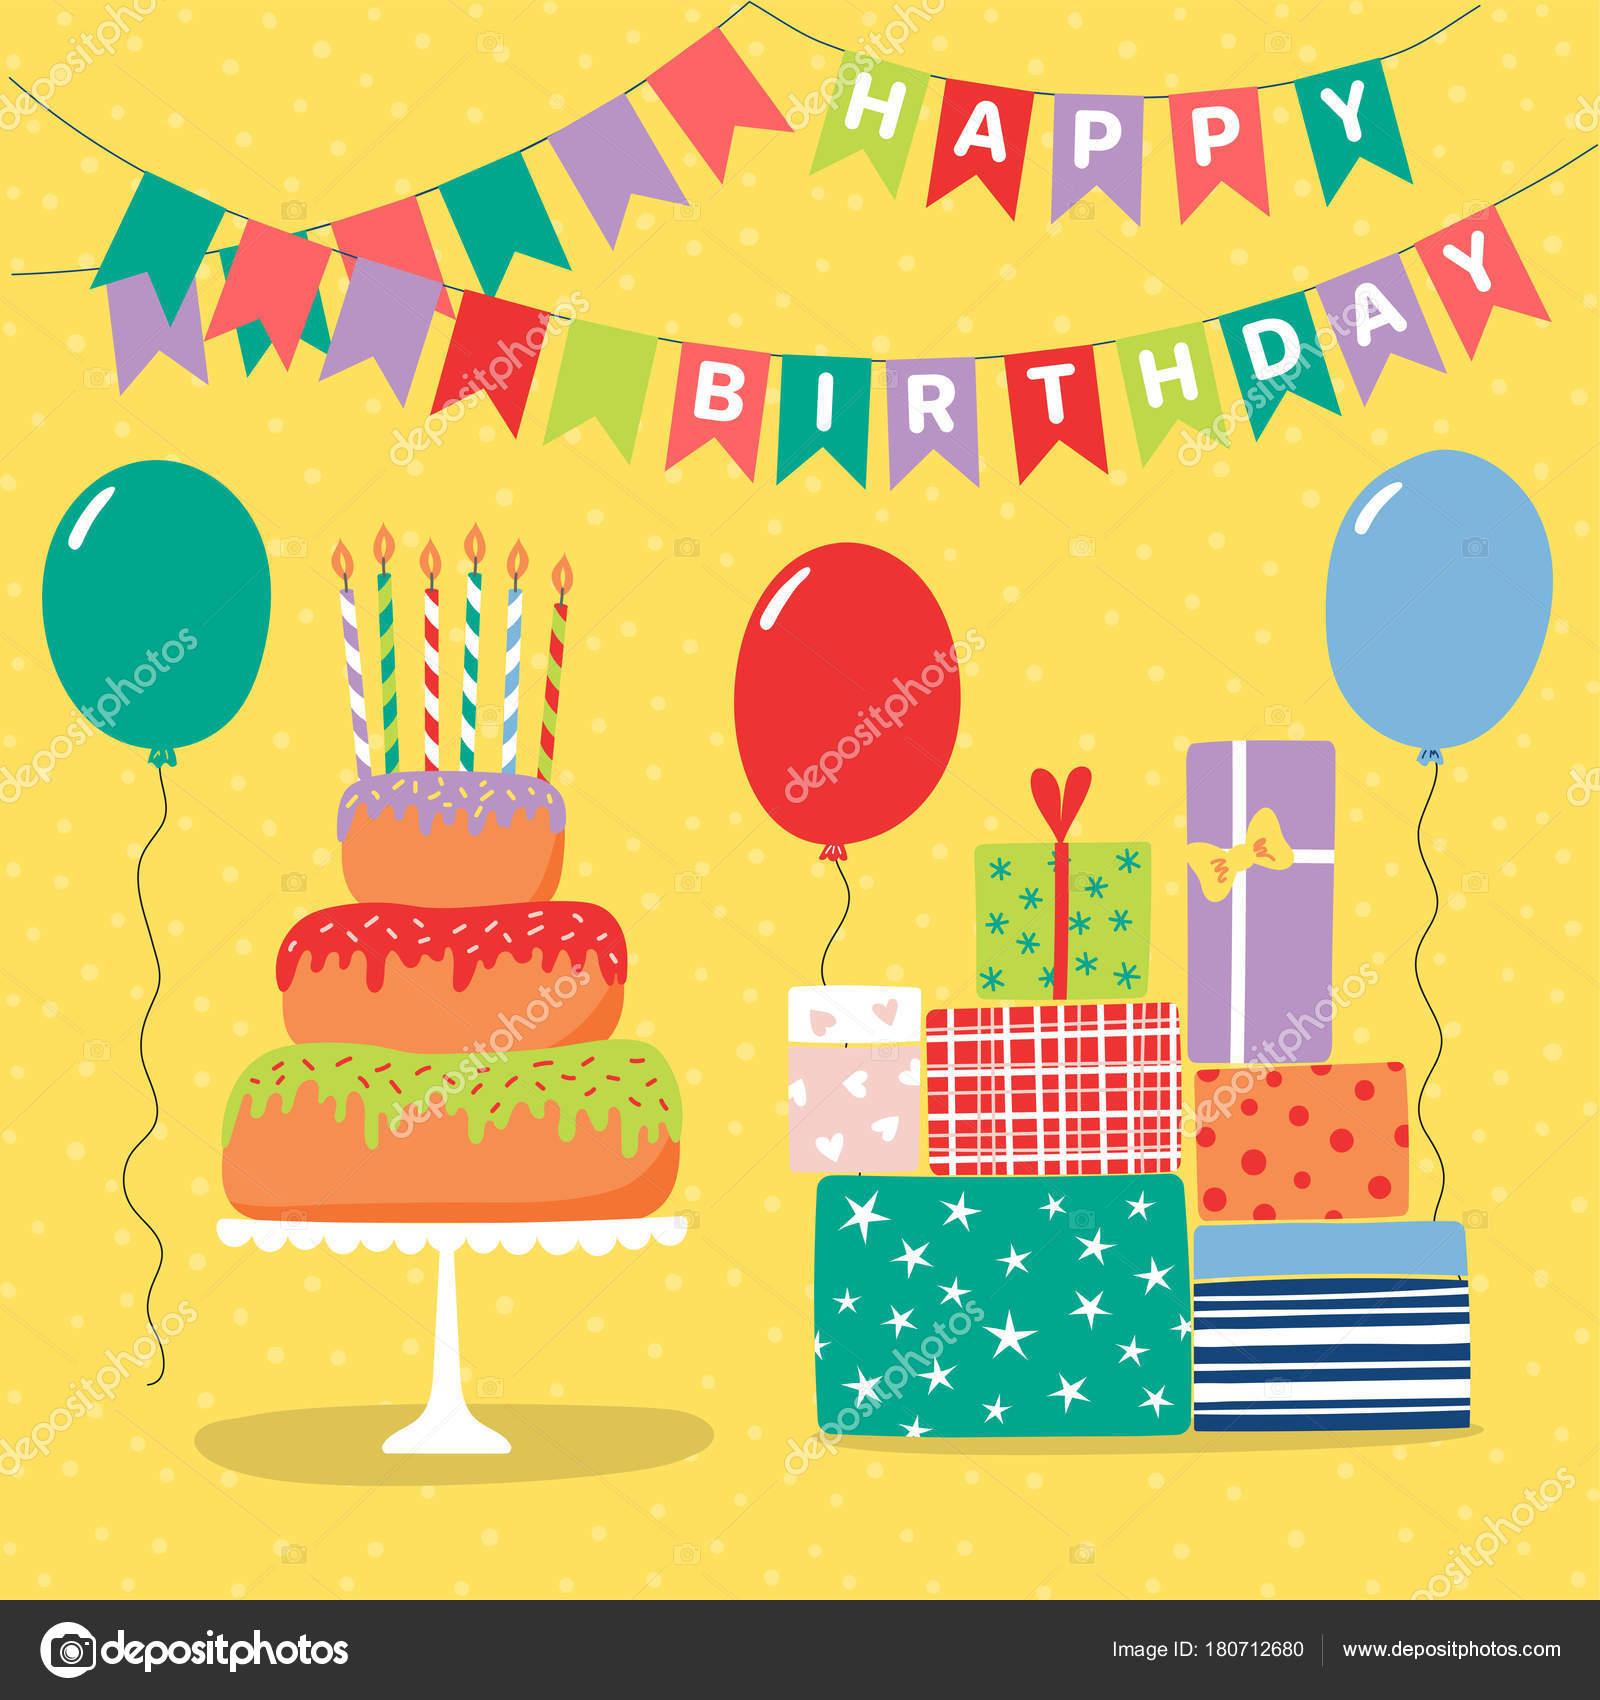 Awe Inspiring Hand Drawn Birthday Card Cartoon Layer Cake Presents Balloons Funny Birthday Cards Online Sheoxdamsfinfo